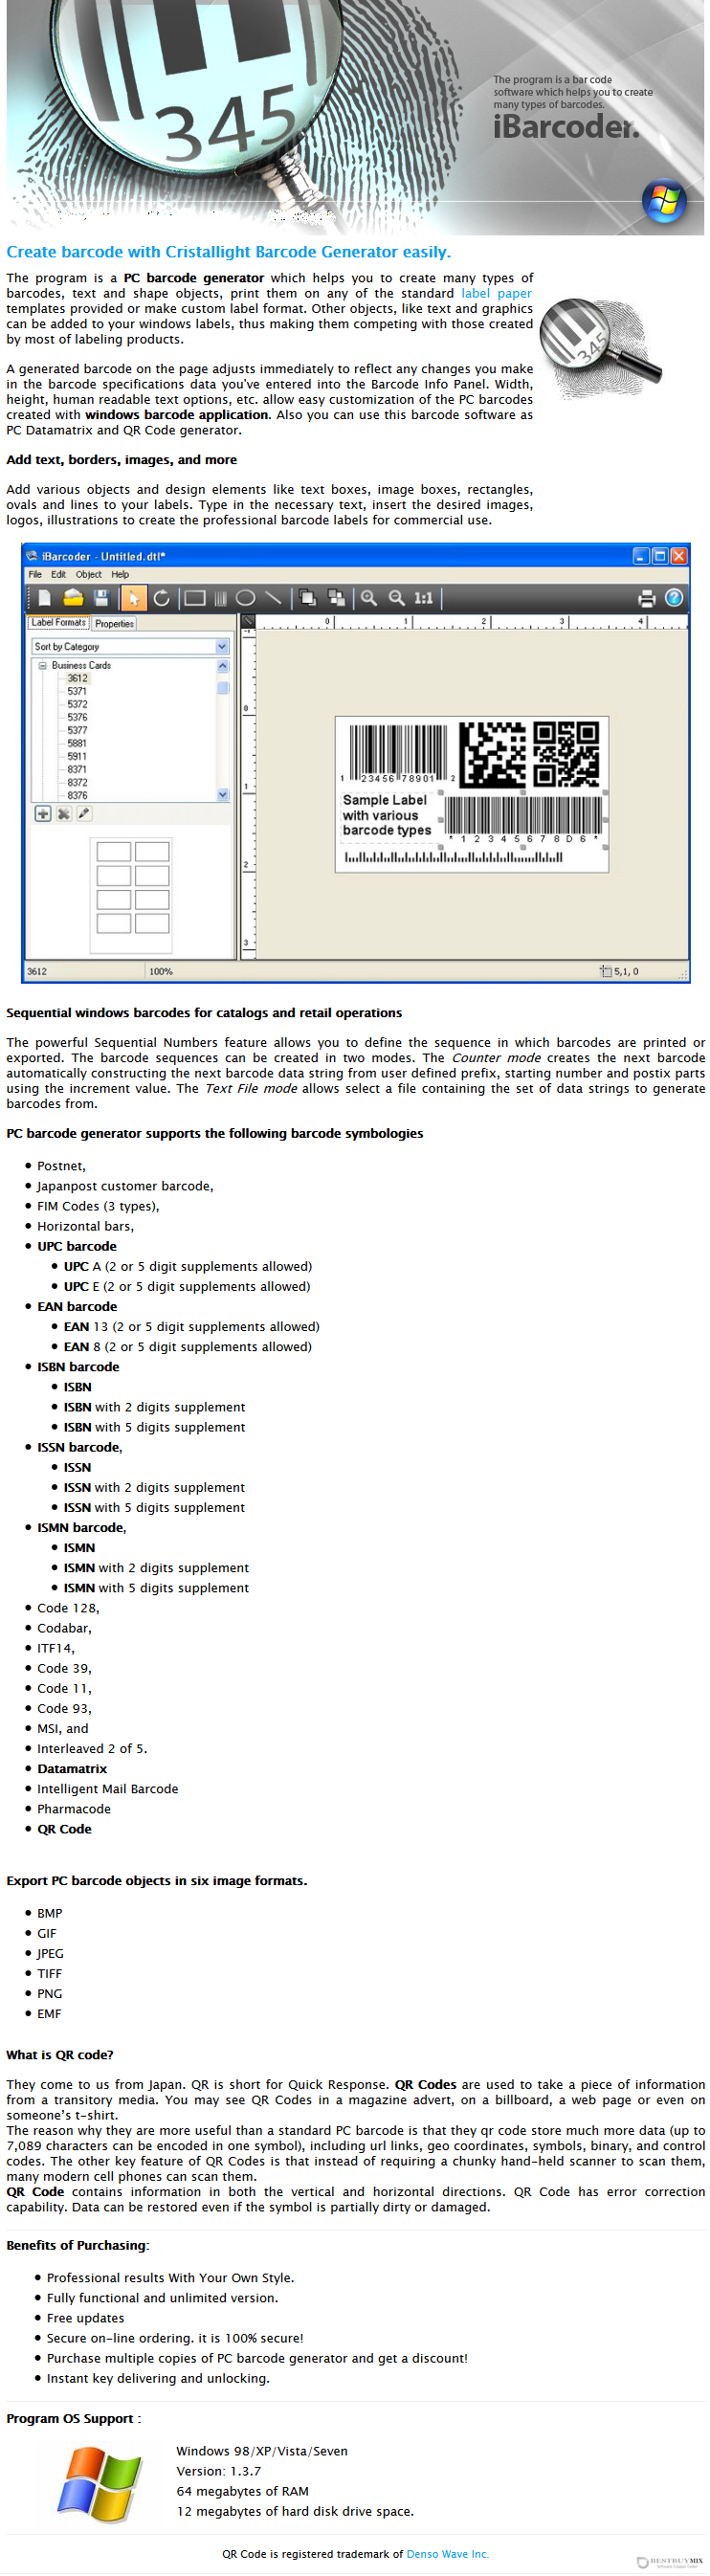 iBarcoder - PC Barcode Generator Discount Coupon Code